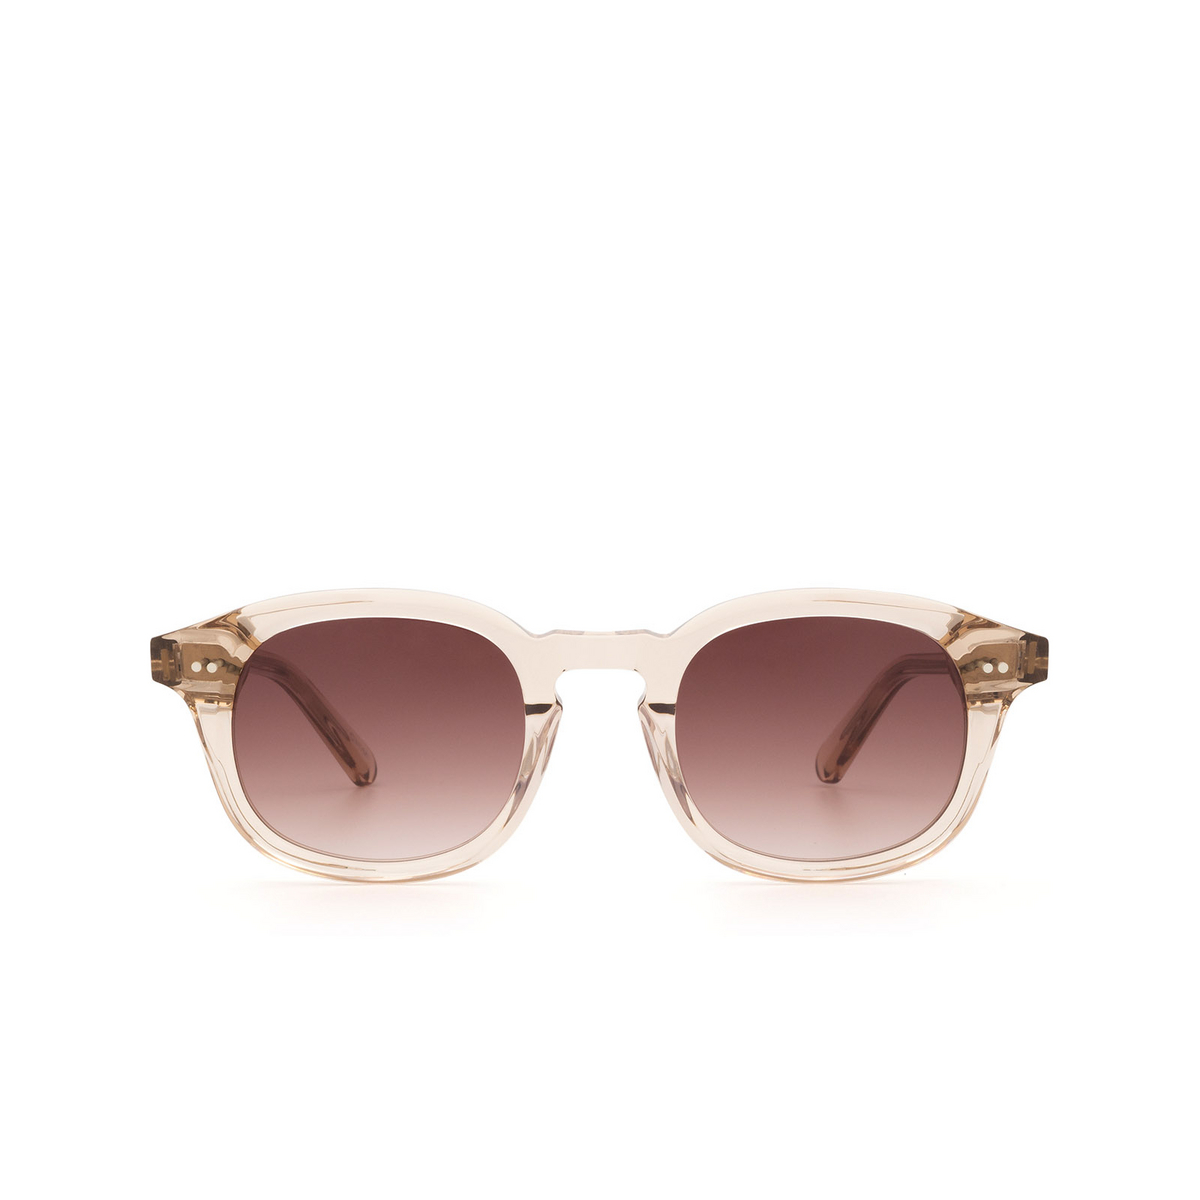 Chimi® Square Sunglasses: #102 color Light Beige Ecru - front view.